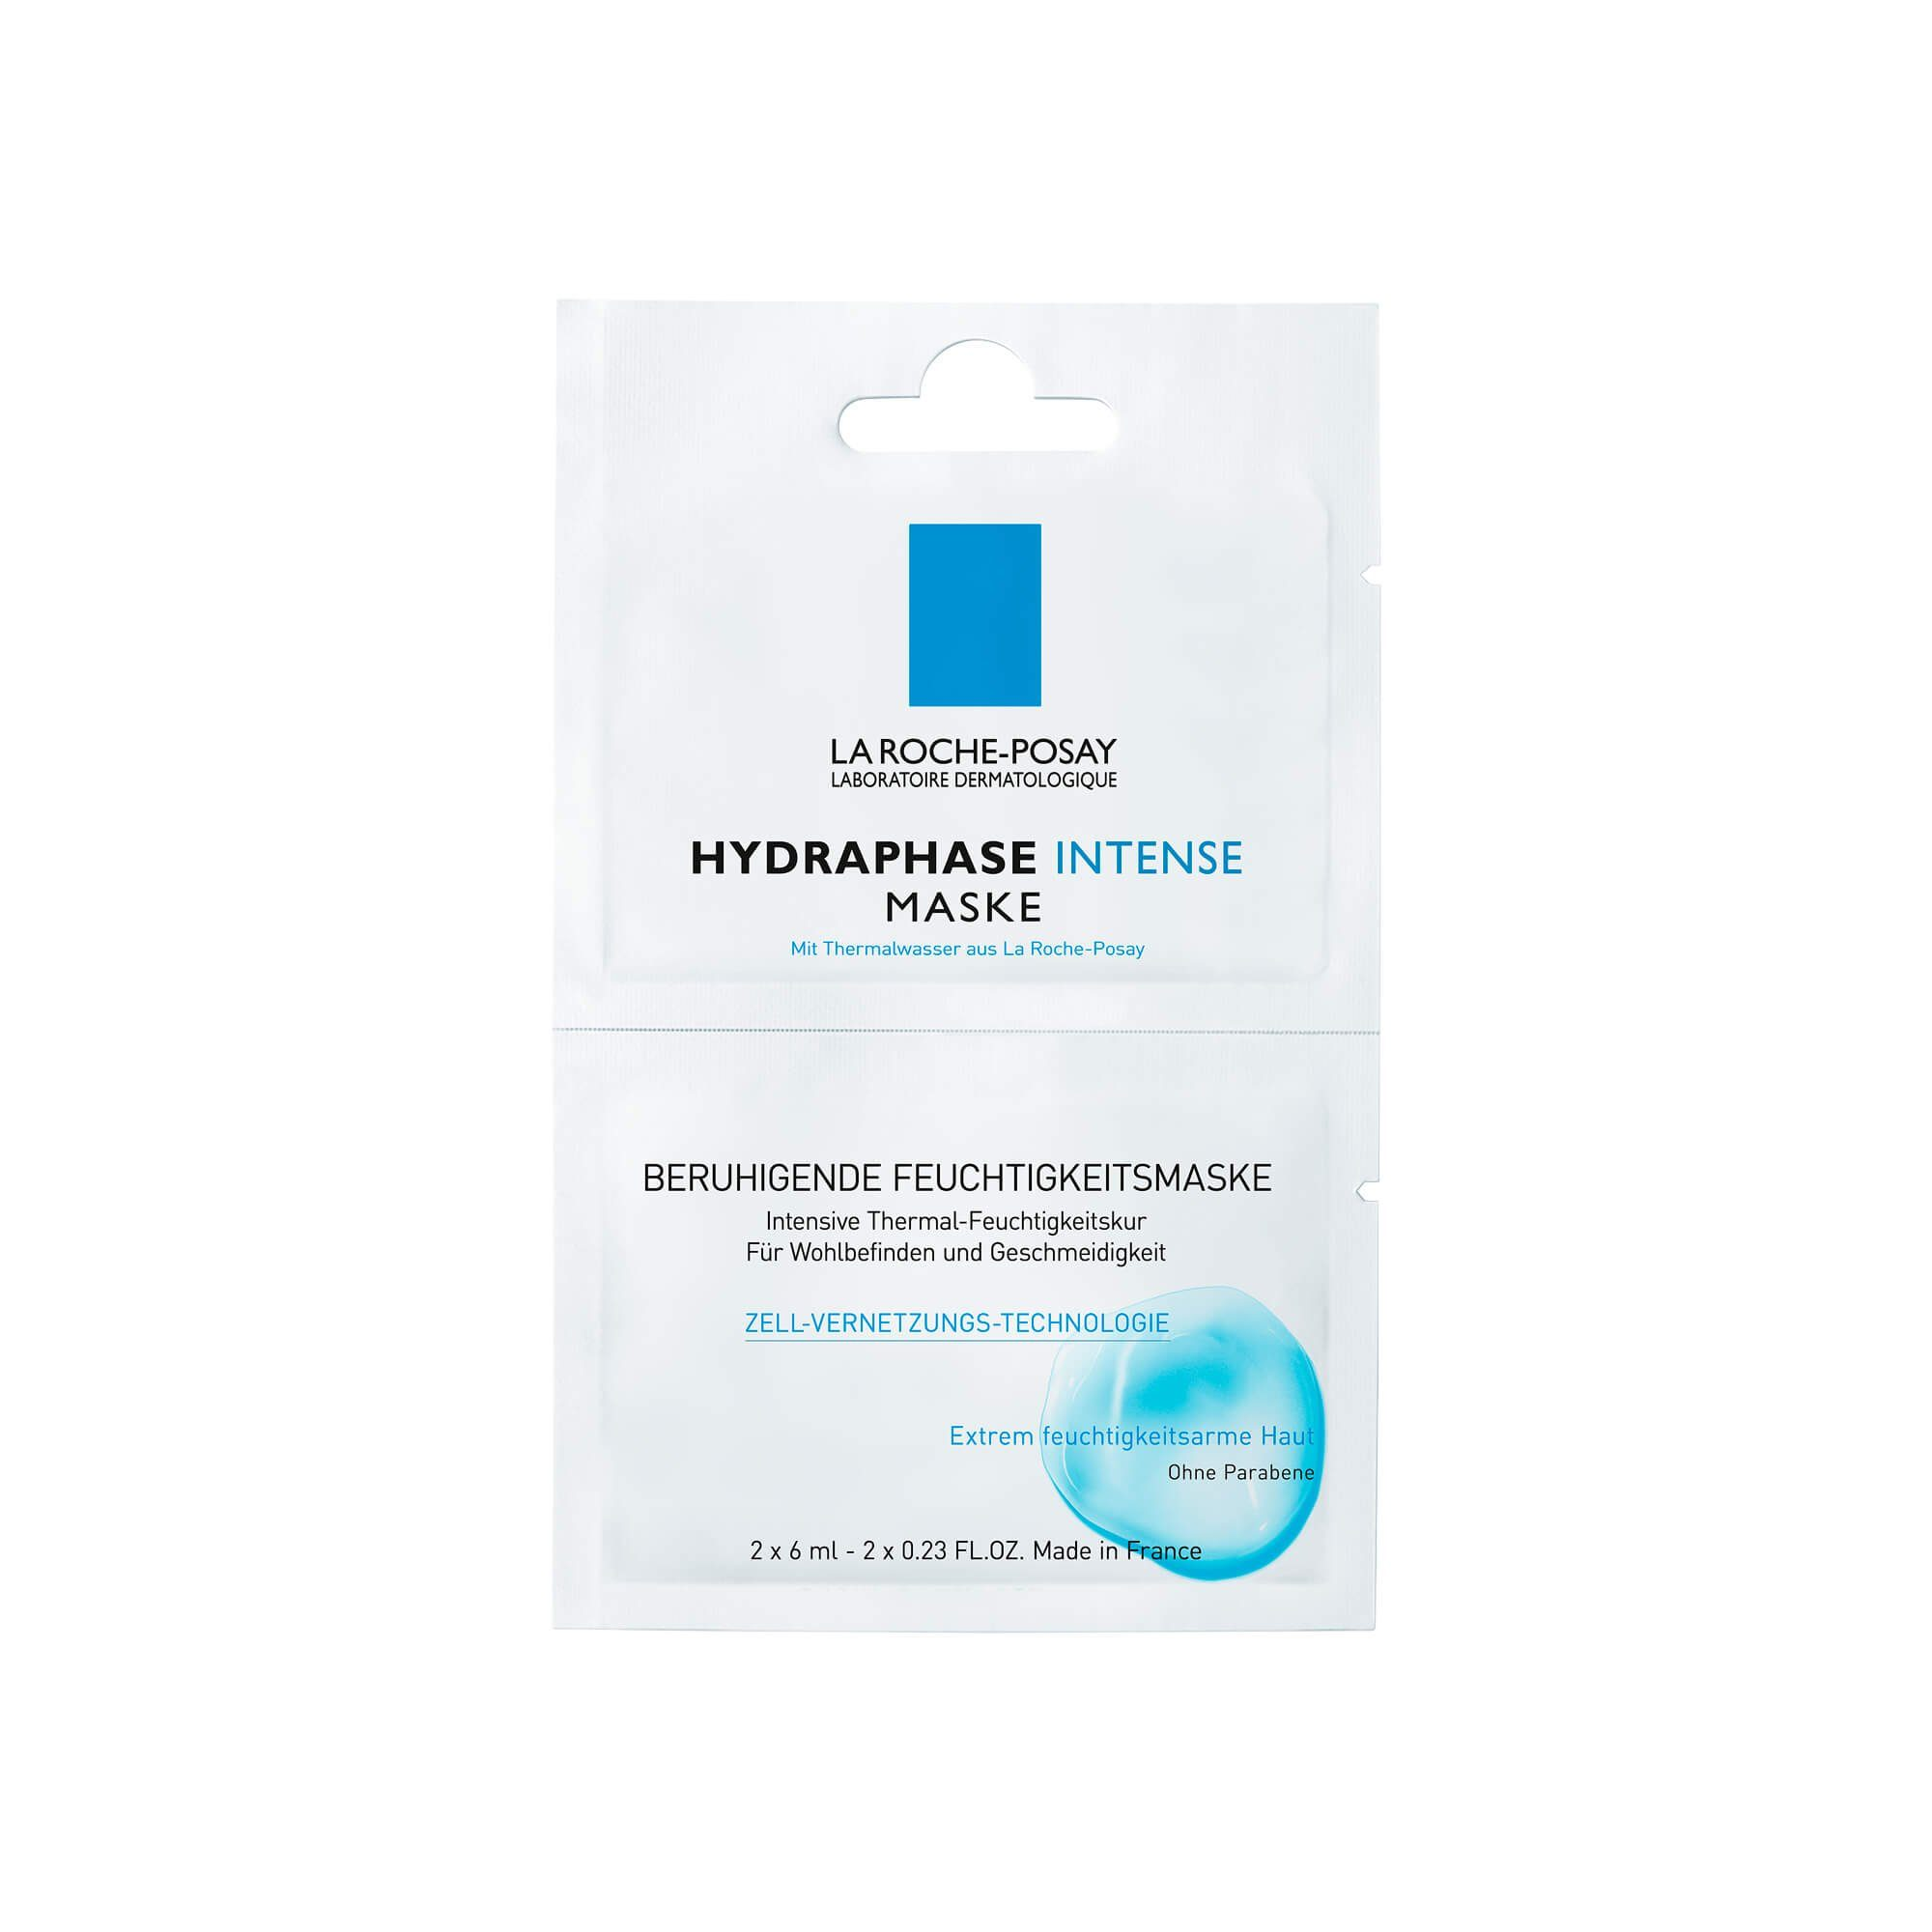 Roche Posay Hydraphase Maske , 2X6 ml